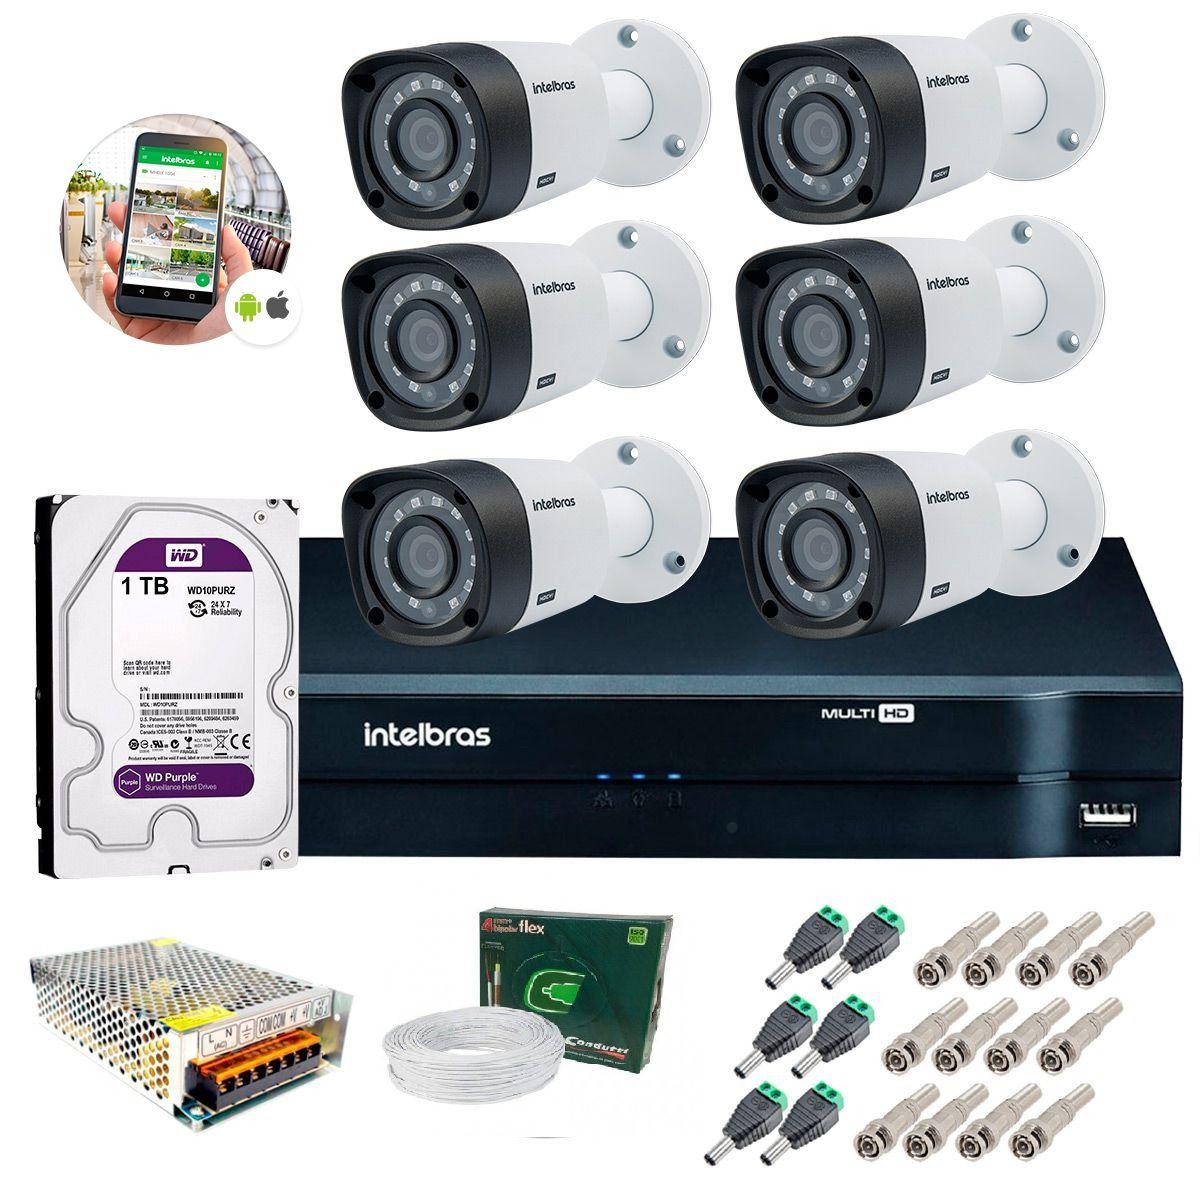 Kit 6 Câmeras de Segurança HD 720p Intelbras VHD 3130 B G4 + DVR Multi HD + HD 1TB + Acessórios